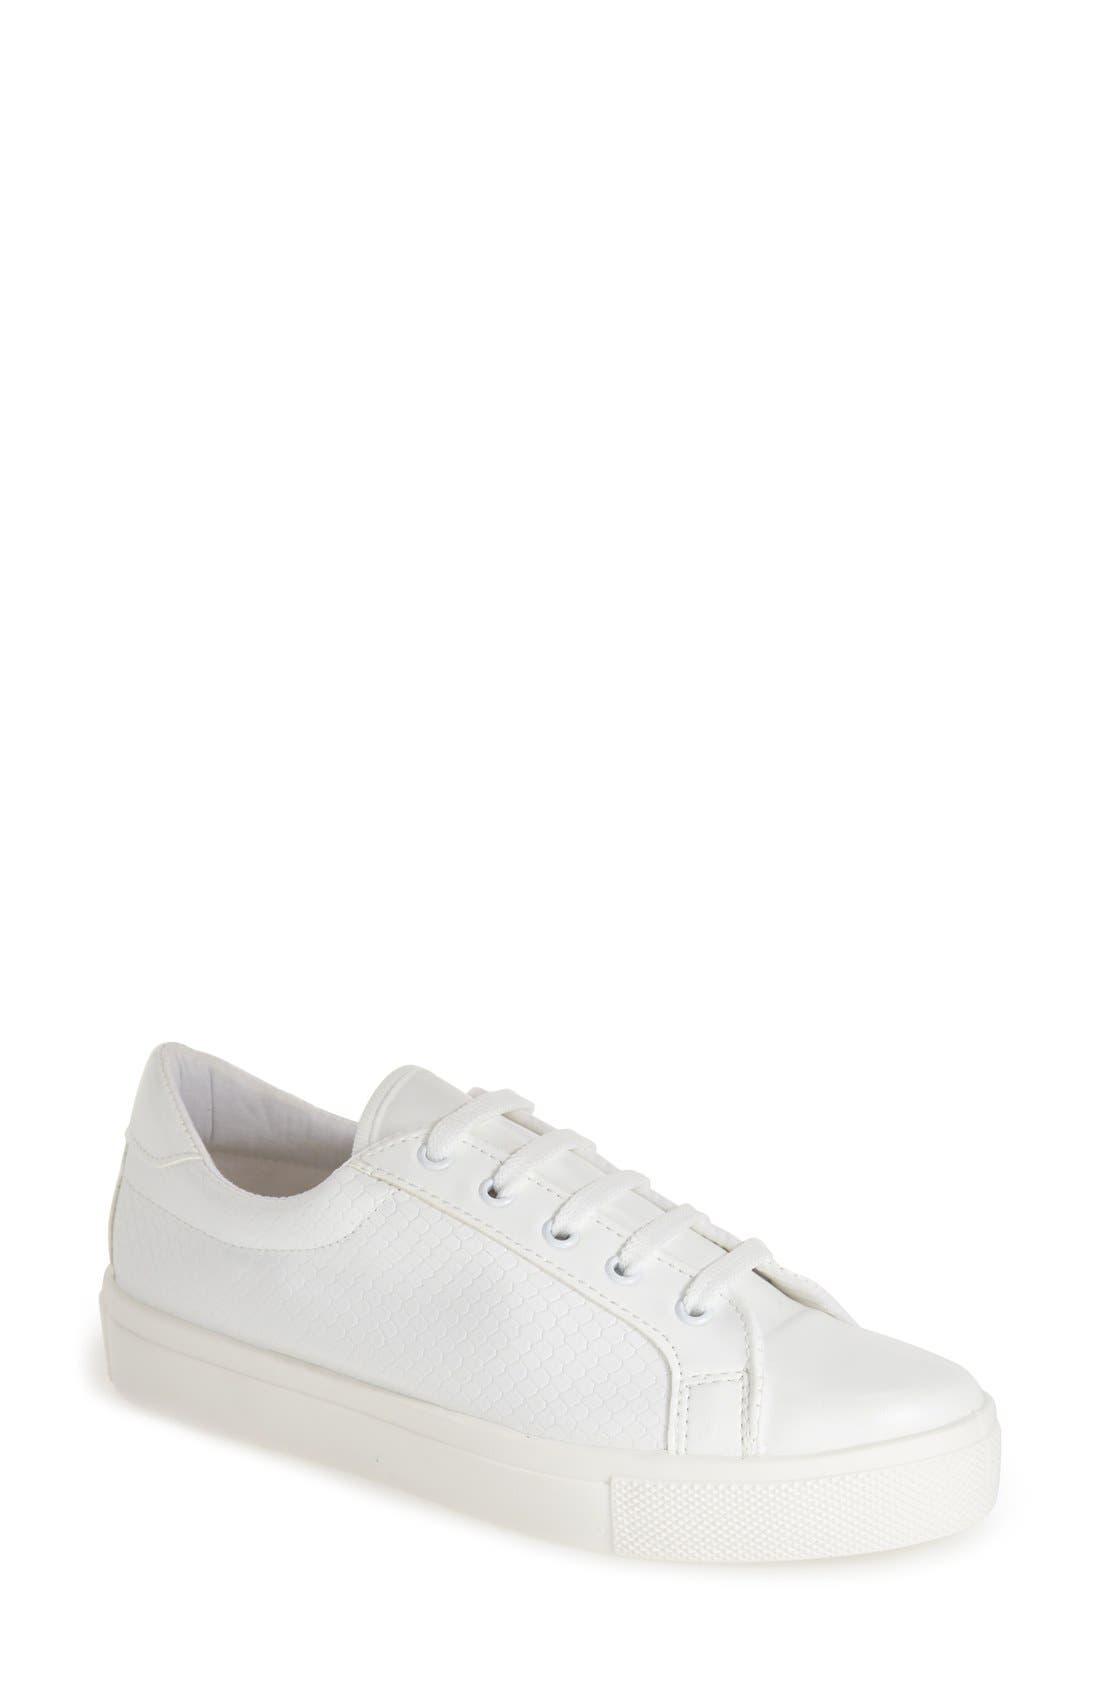 'Copenhagen' Lizard Embossed Faux Leather Sneaker,                             Main thumbnail 1, color,                             White